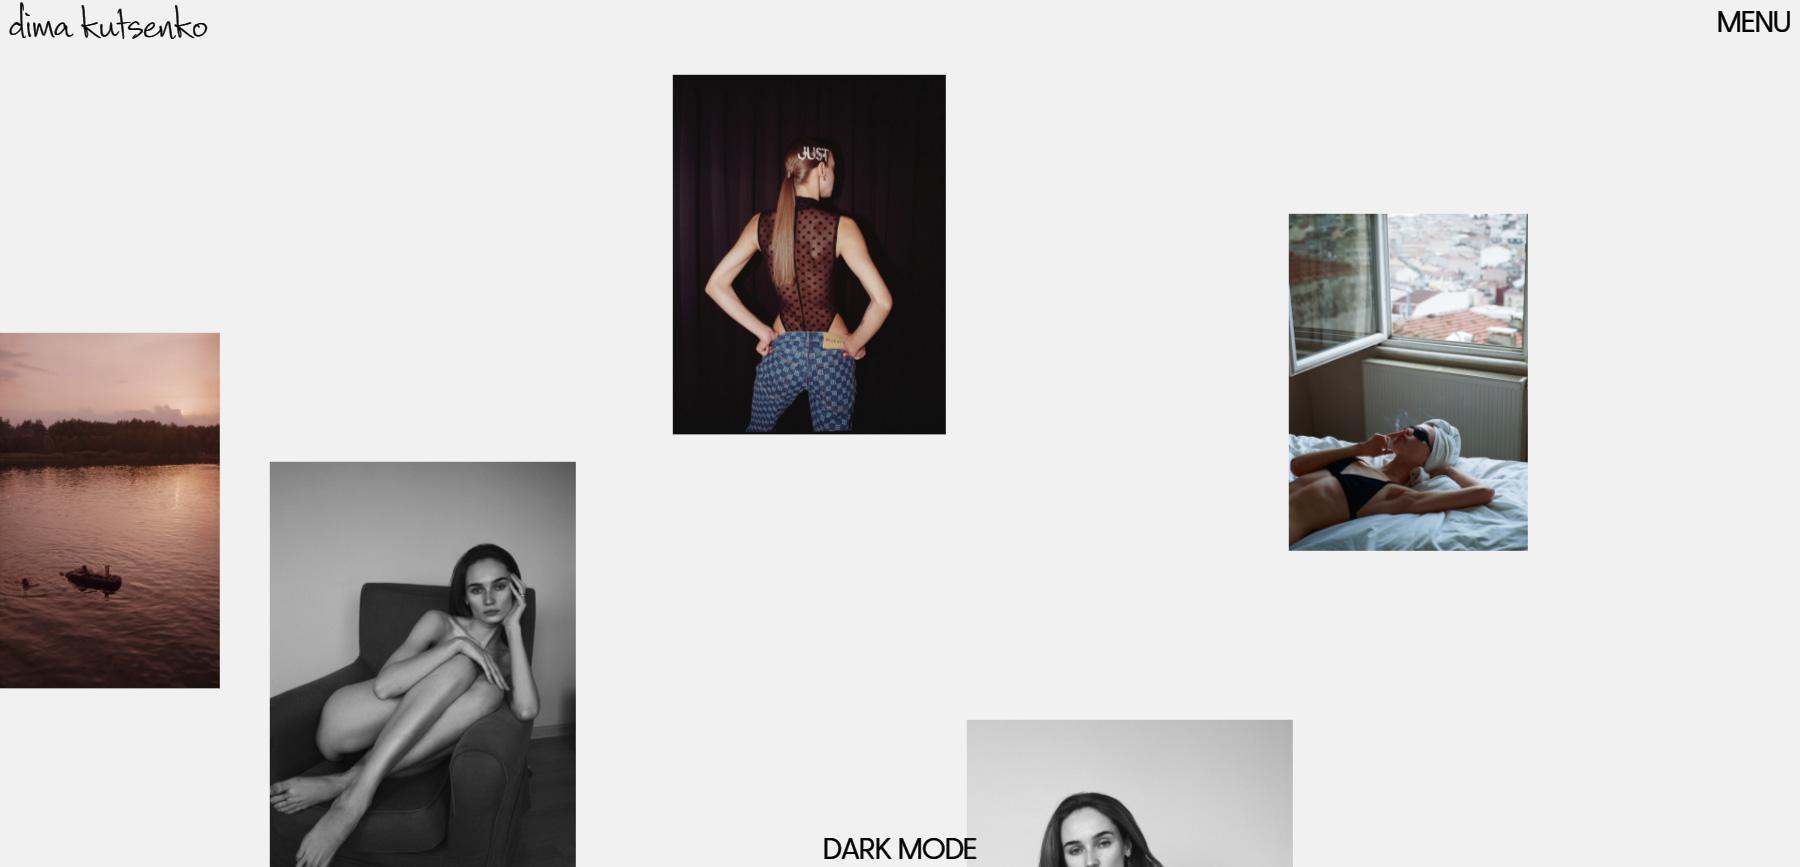 Dima Kutsenko - Website of the Day